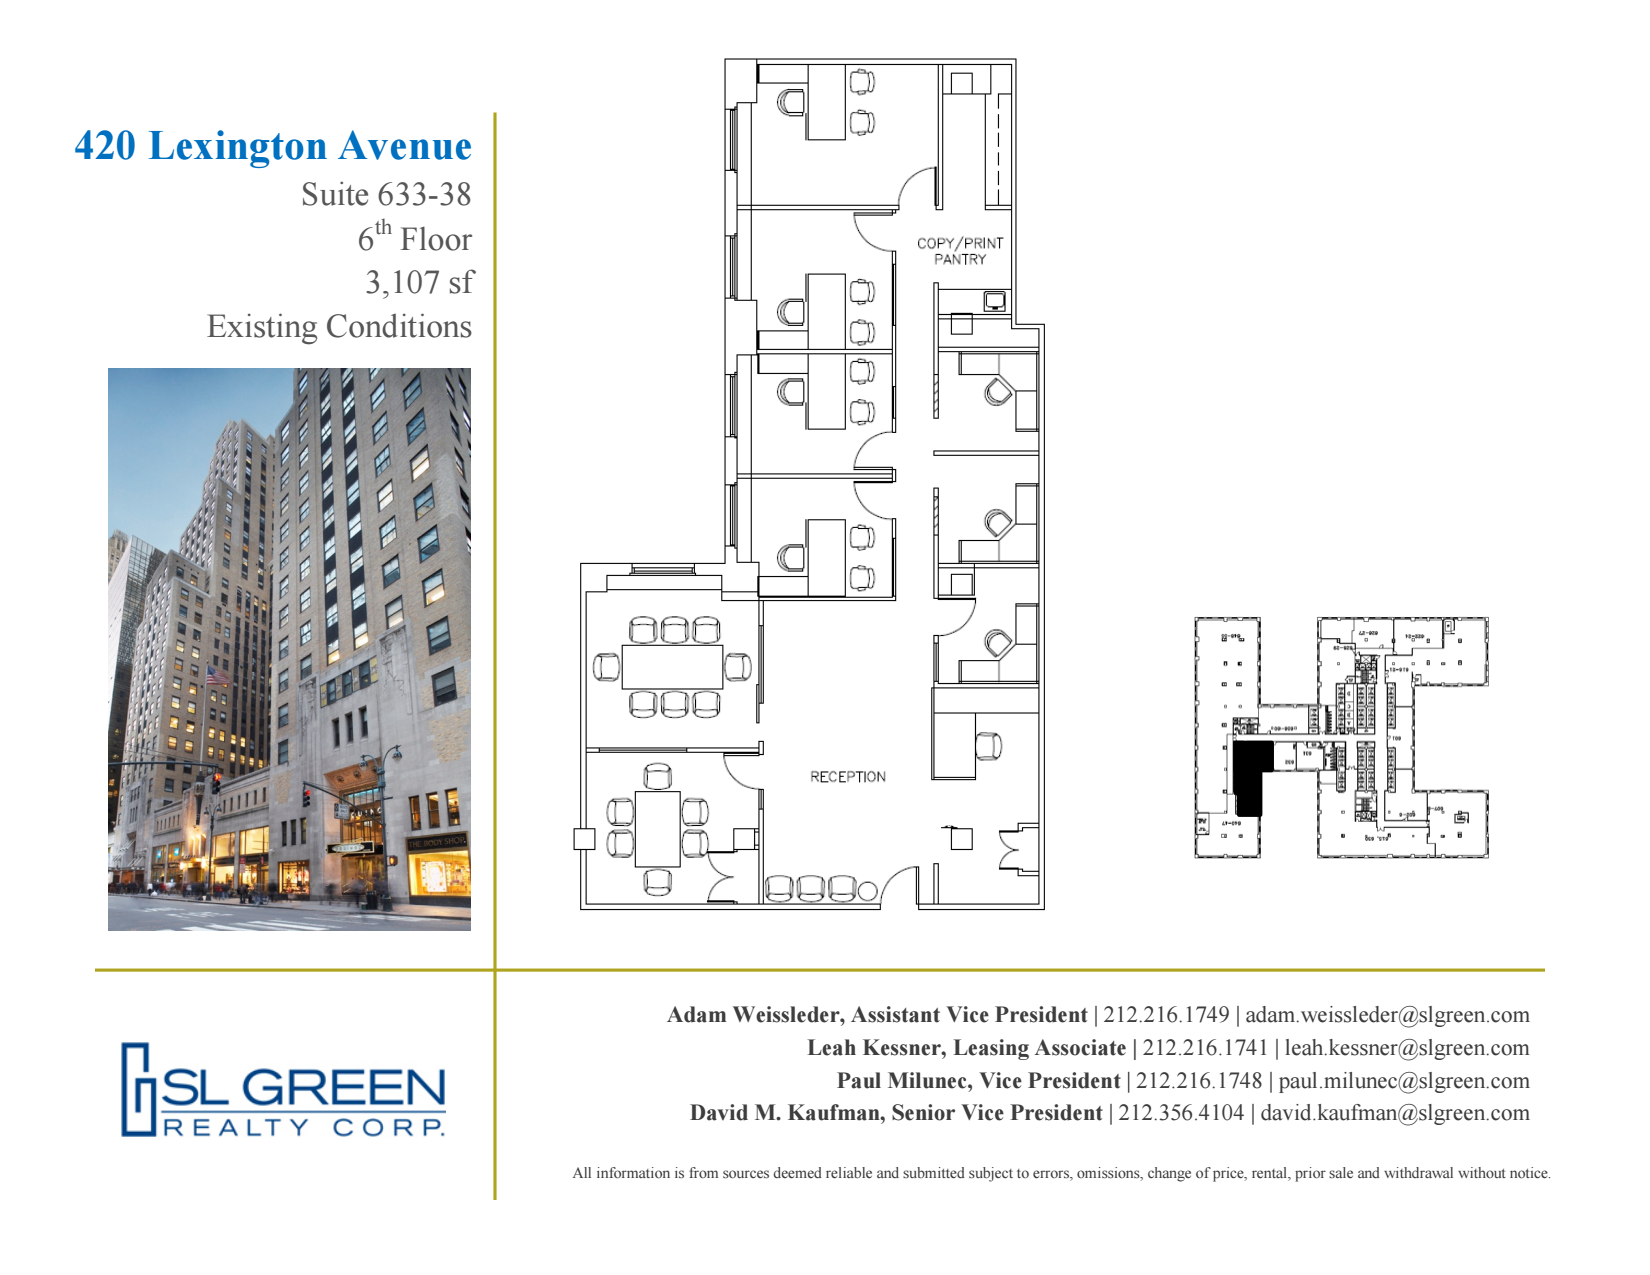 Graybar Building 420 Lexington Avenue 6th Floor Unit 633 38 Vts Diagram 3 Sixth Layout Plan